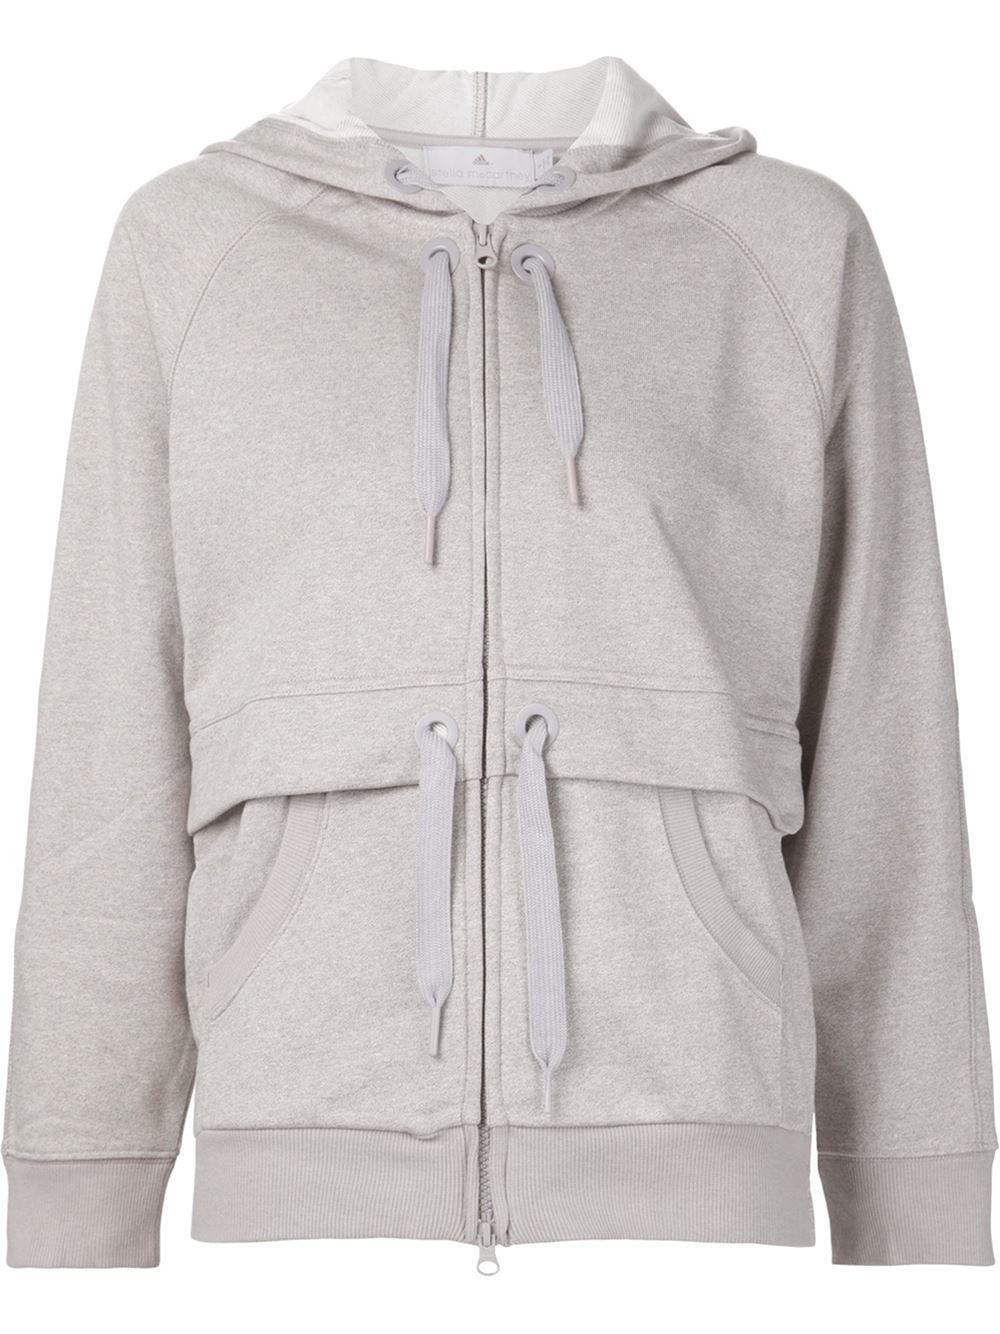 cbf41e9e23aa Lyst - adidas By Stella McCartney Essentials Hoodie in Gray